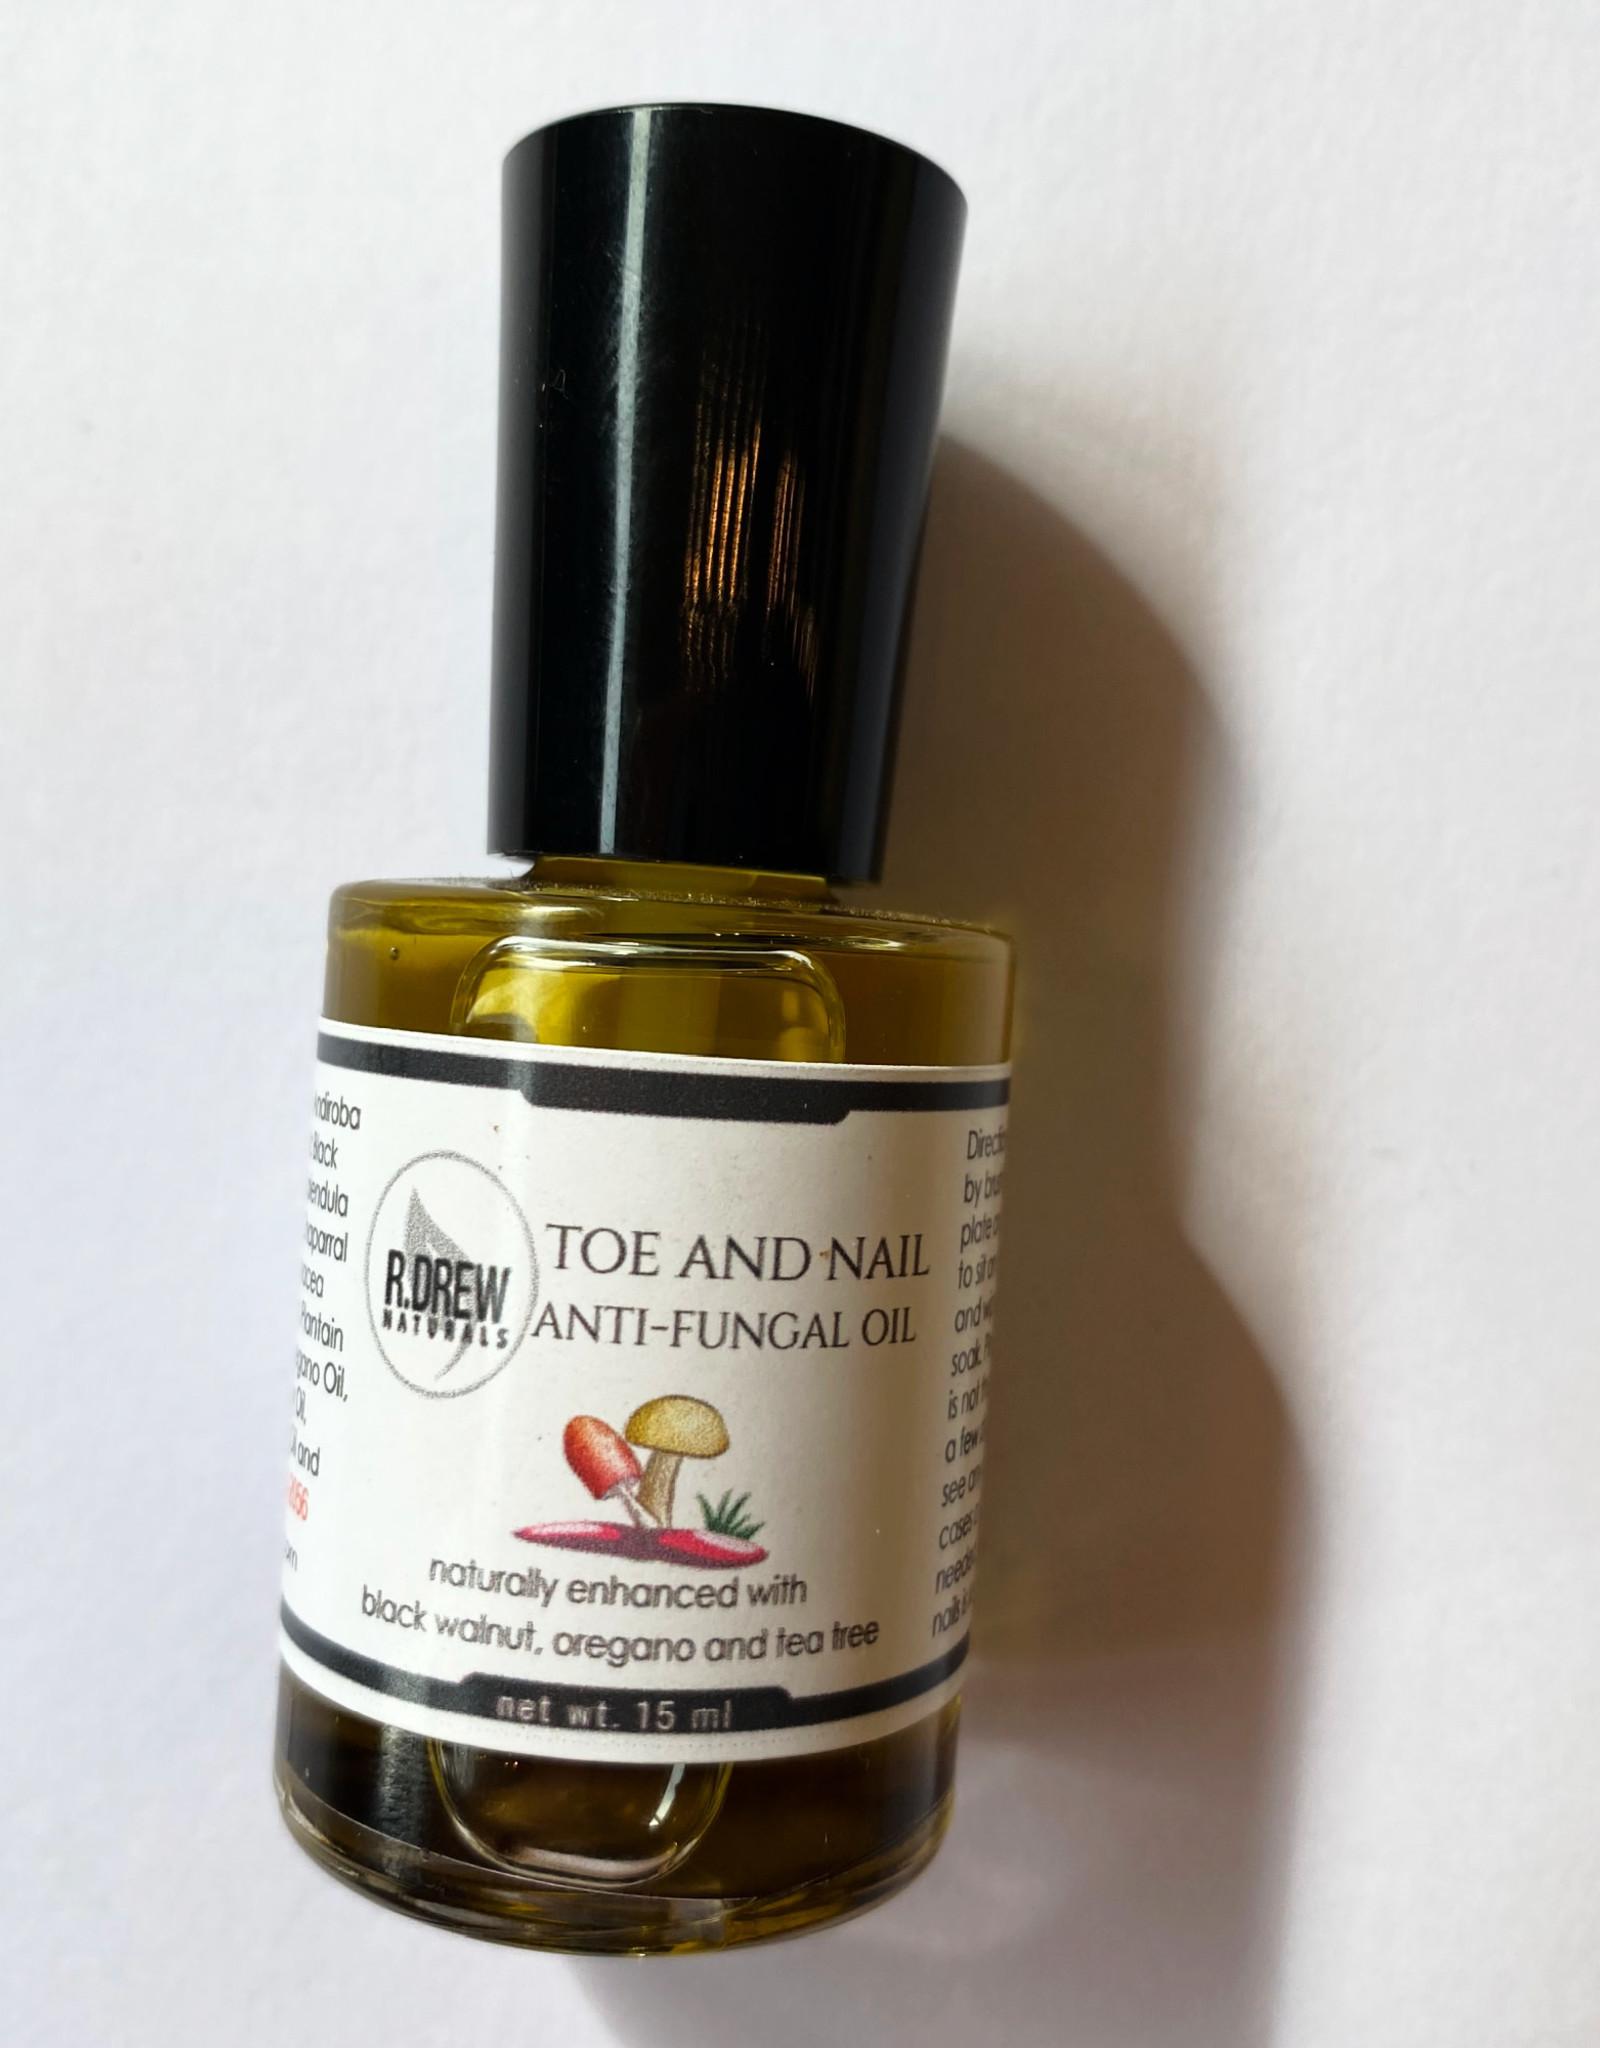 R Drew Naturals Toe and Nail Anti-Fungal Oil